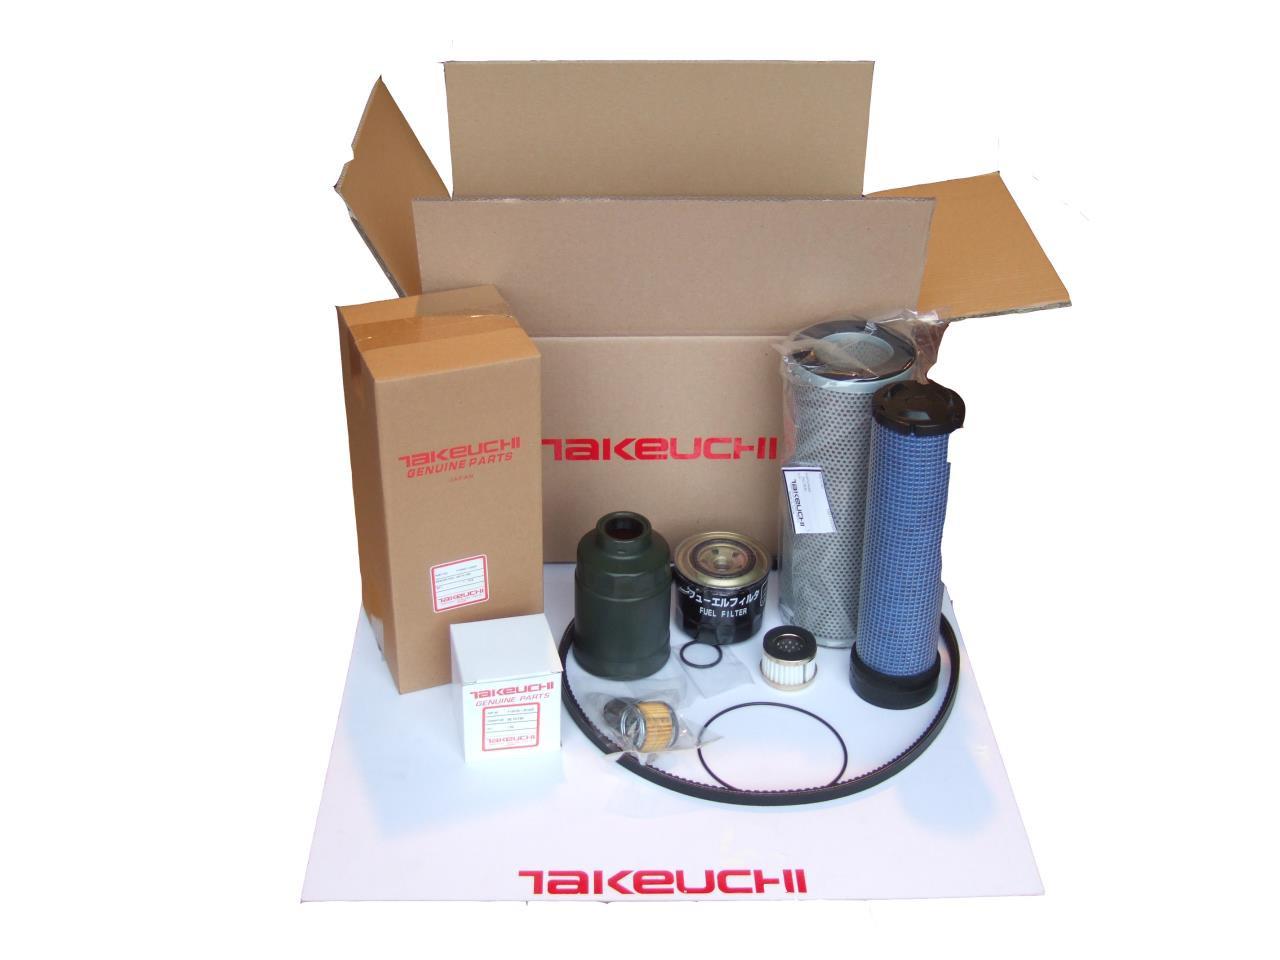 Takeuchi TB225 filtersæt